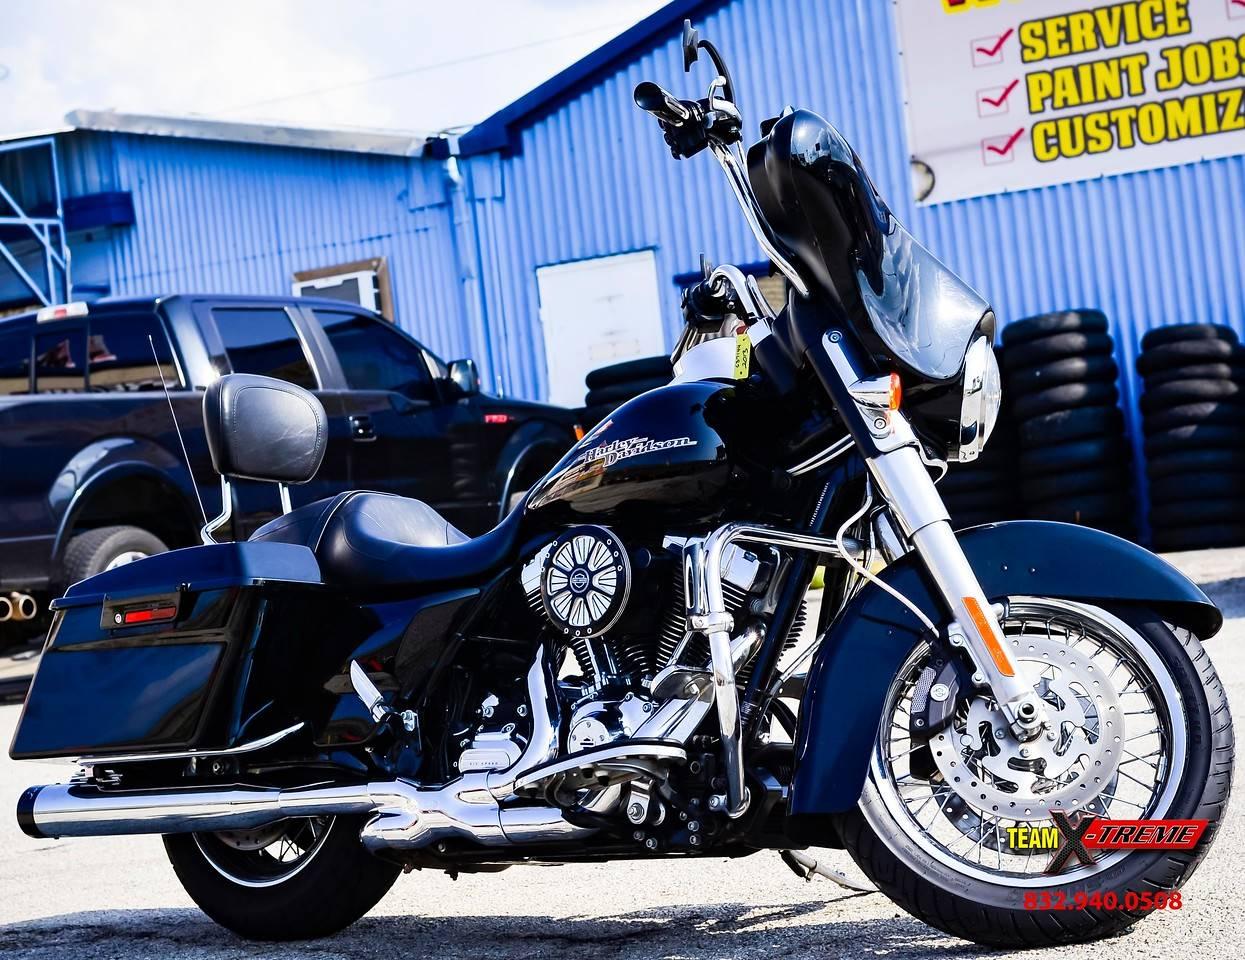 2017 Harley Davidson Street Glide In Houston Texas